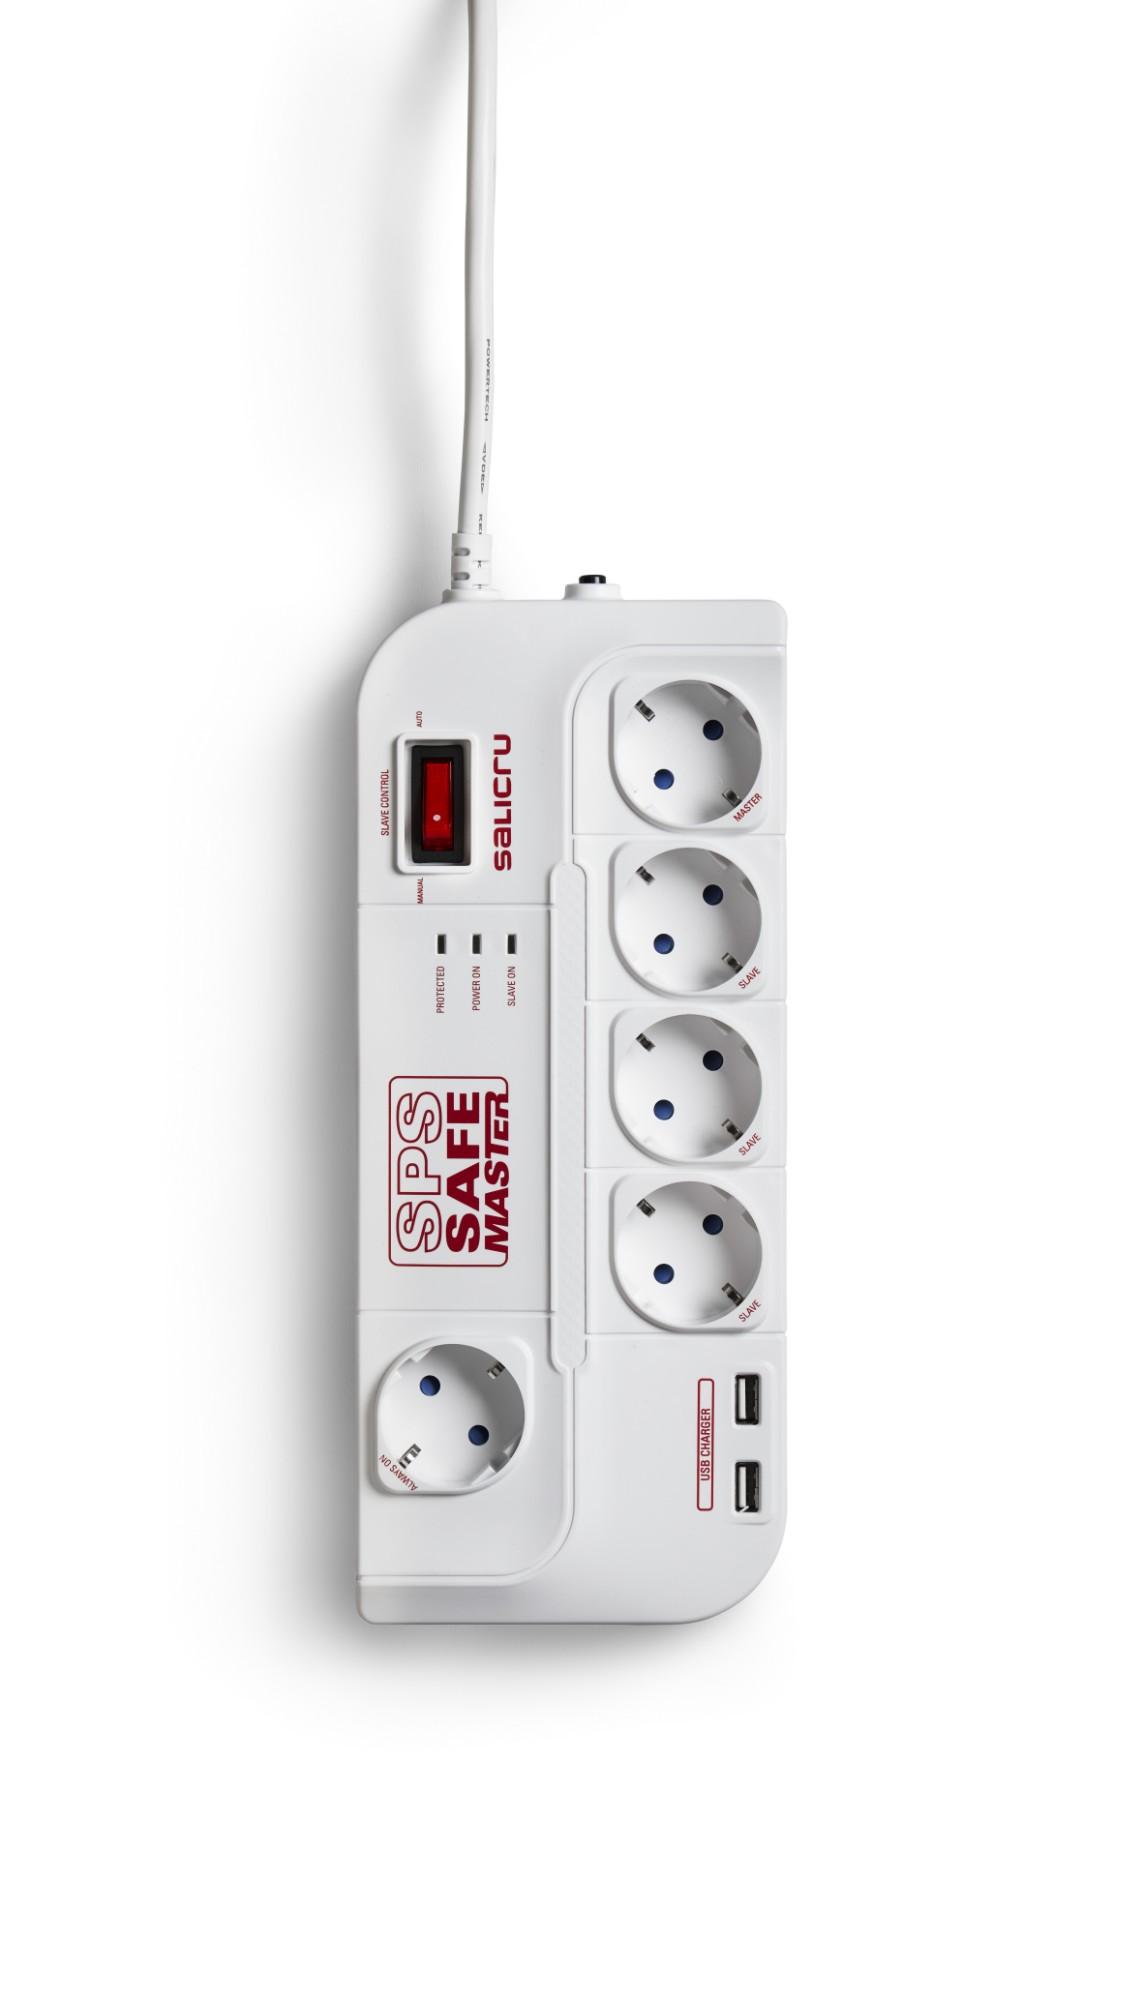 Salicru SPS Safe Master Protectores eléctricos activos